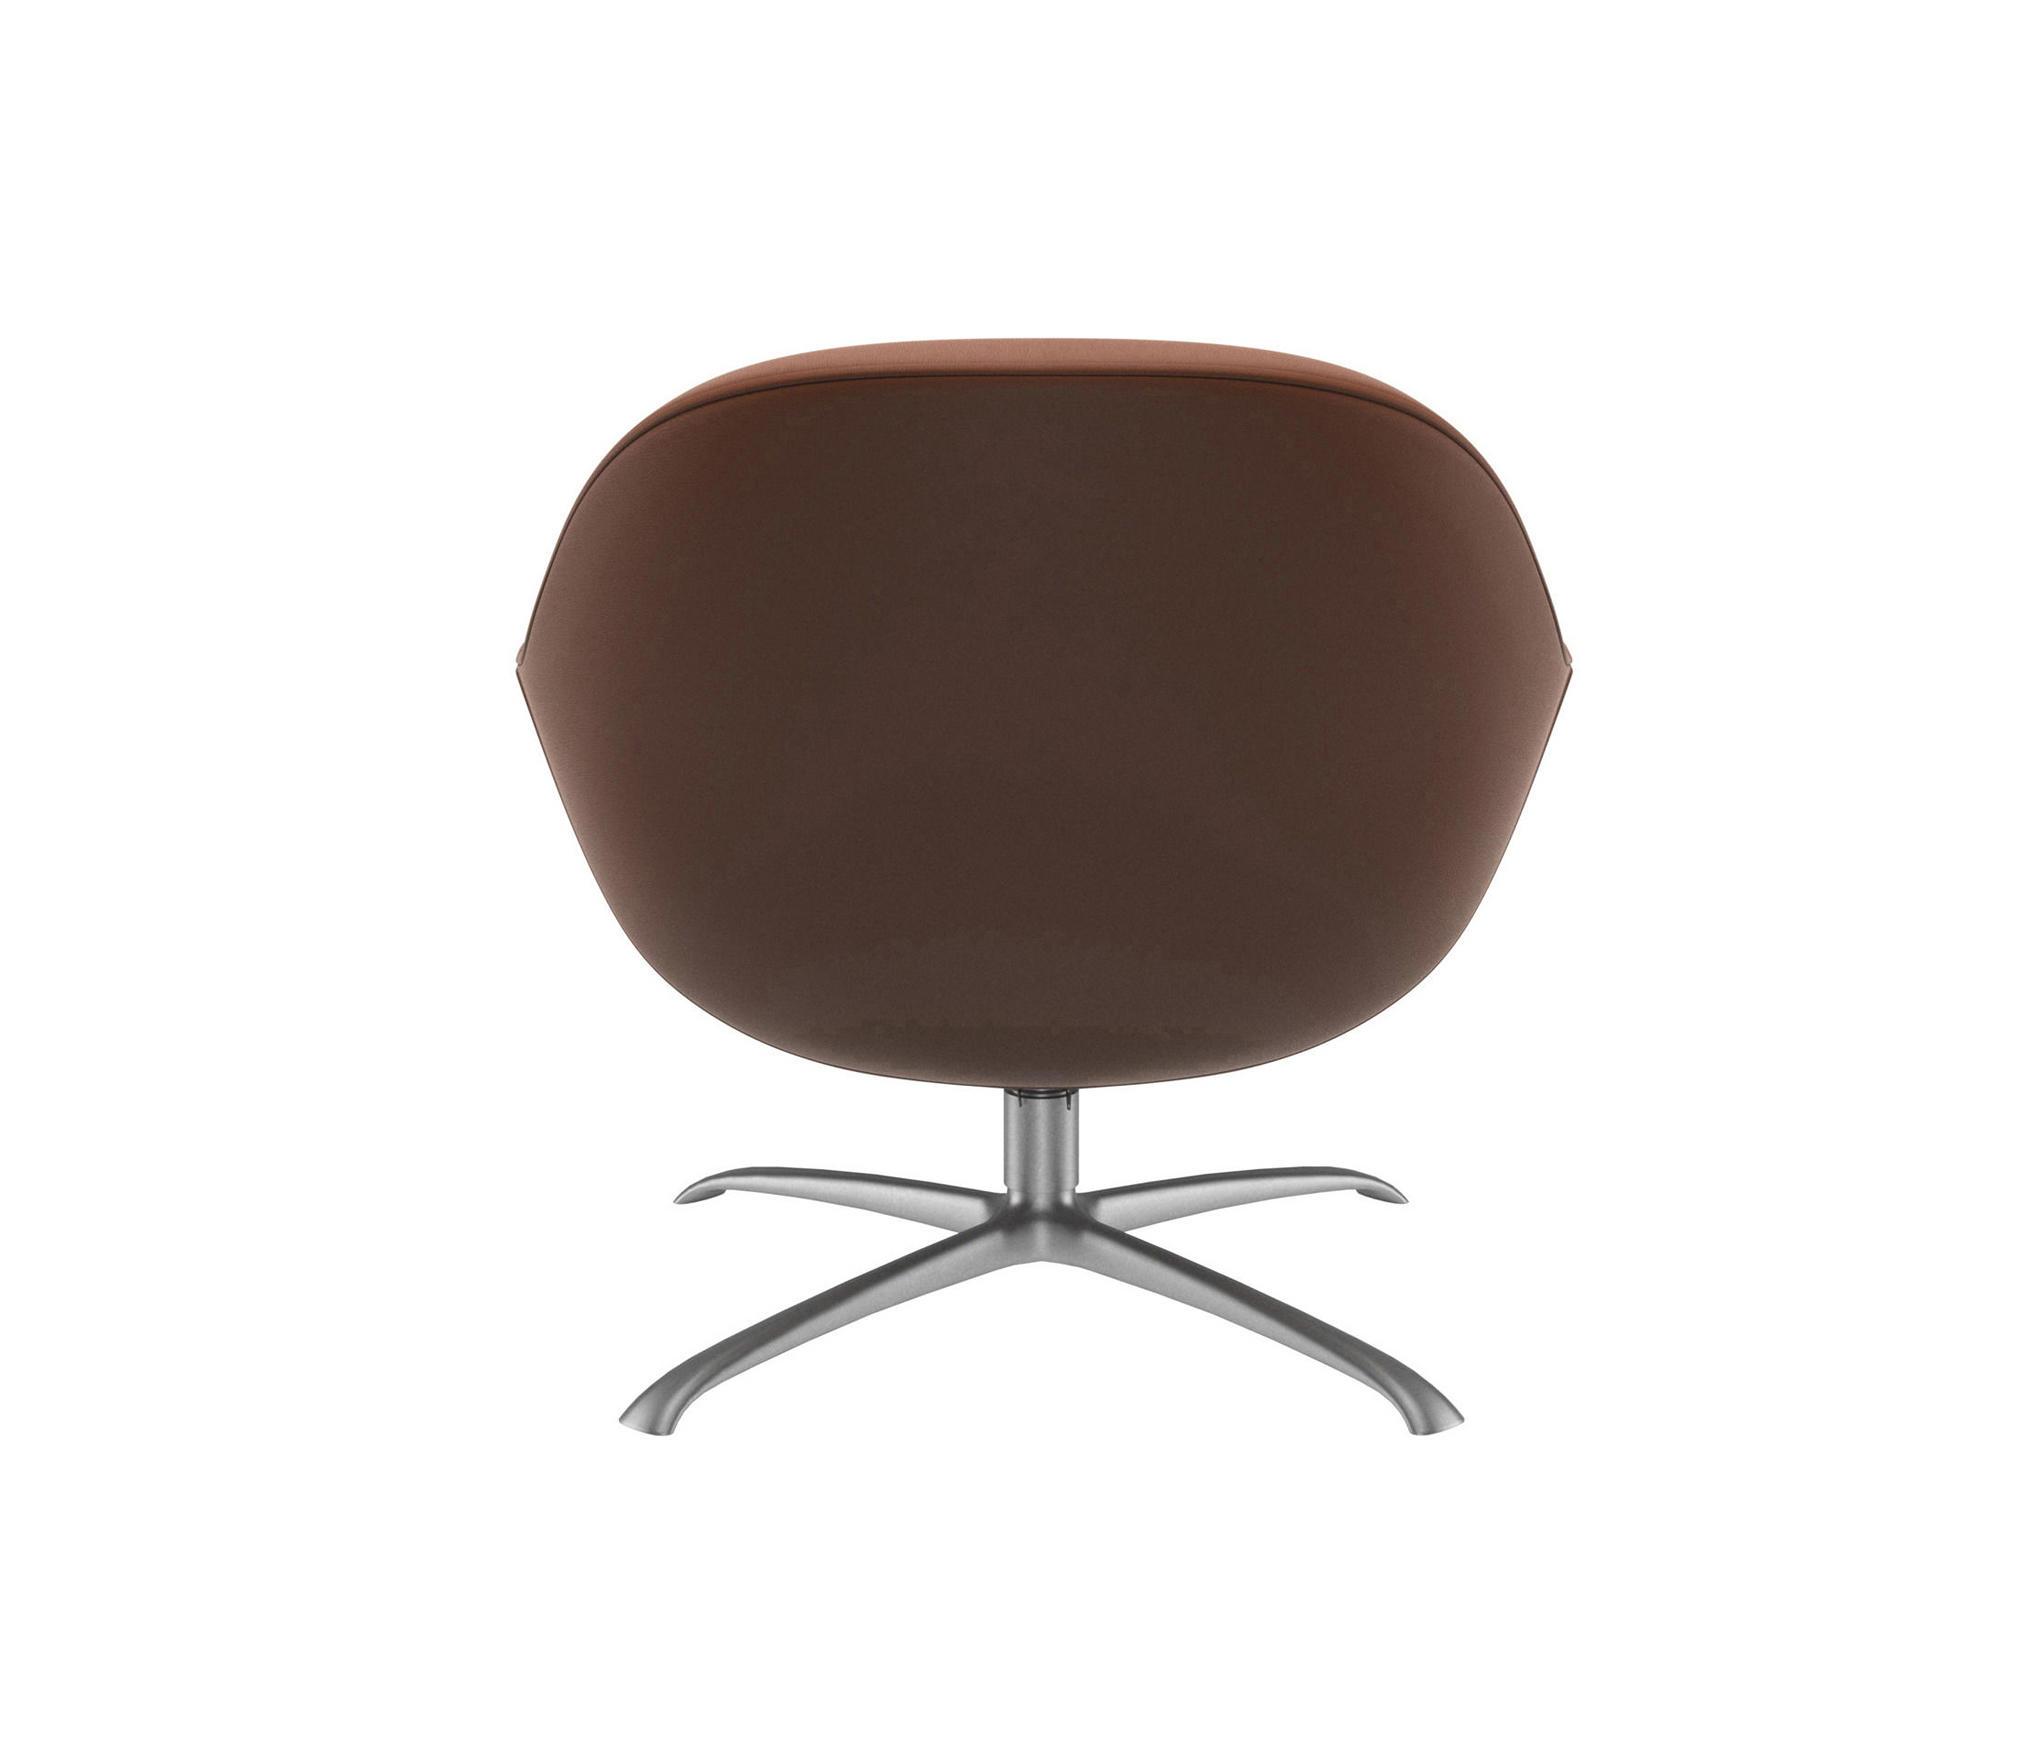 Bo Concept La Garde veneto lounge chair 0012 with swivel function | architonic